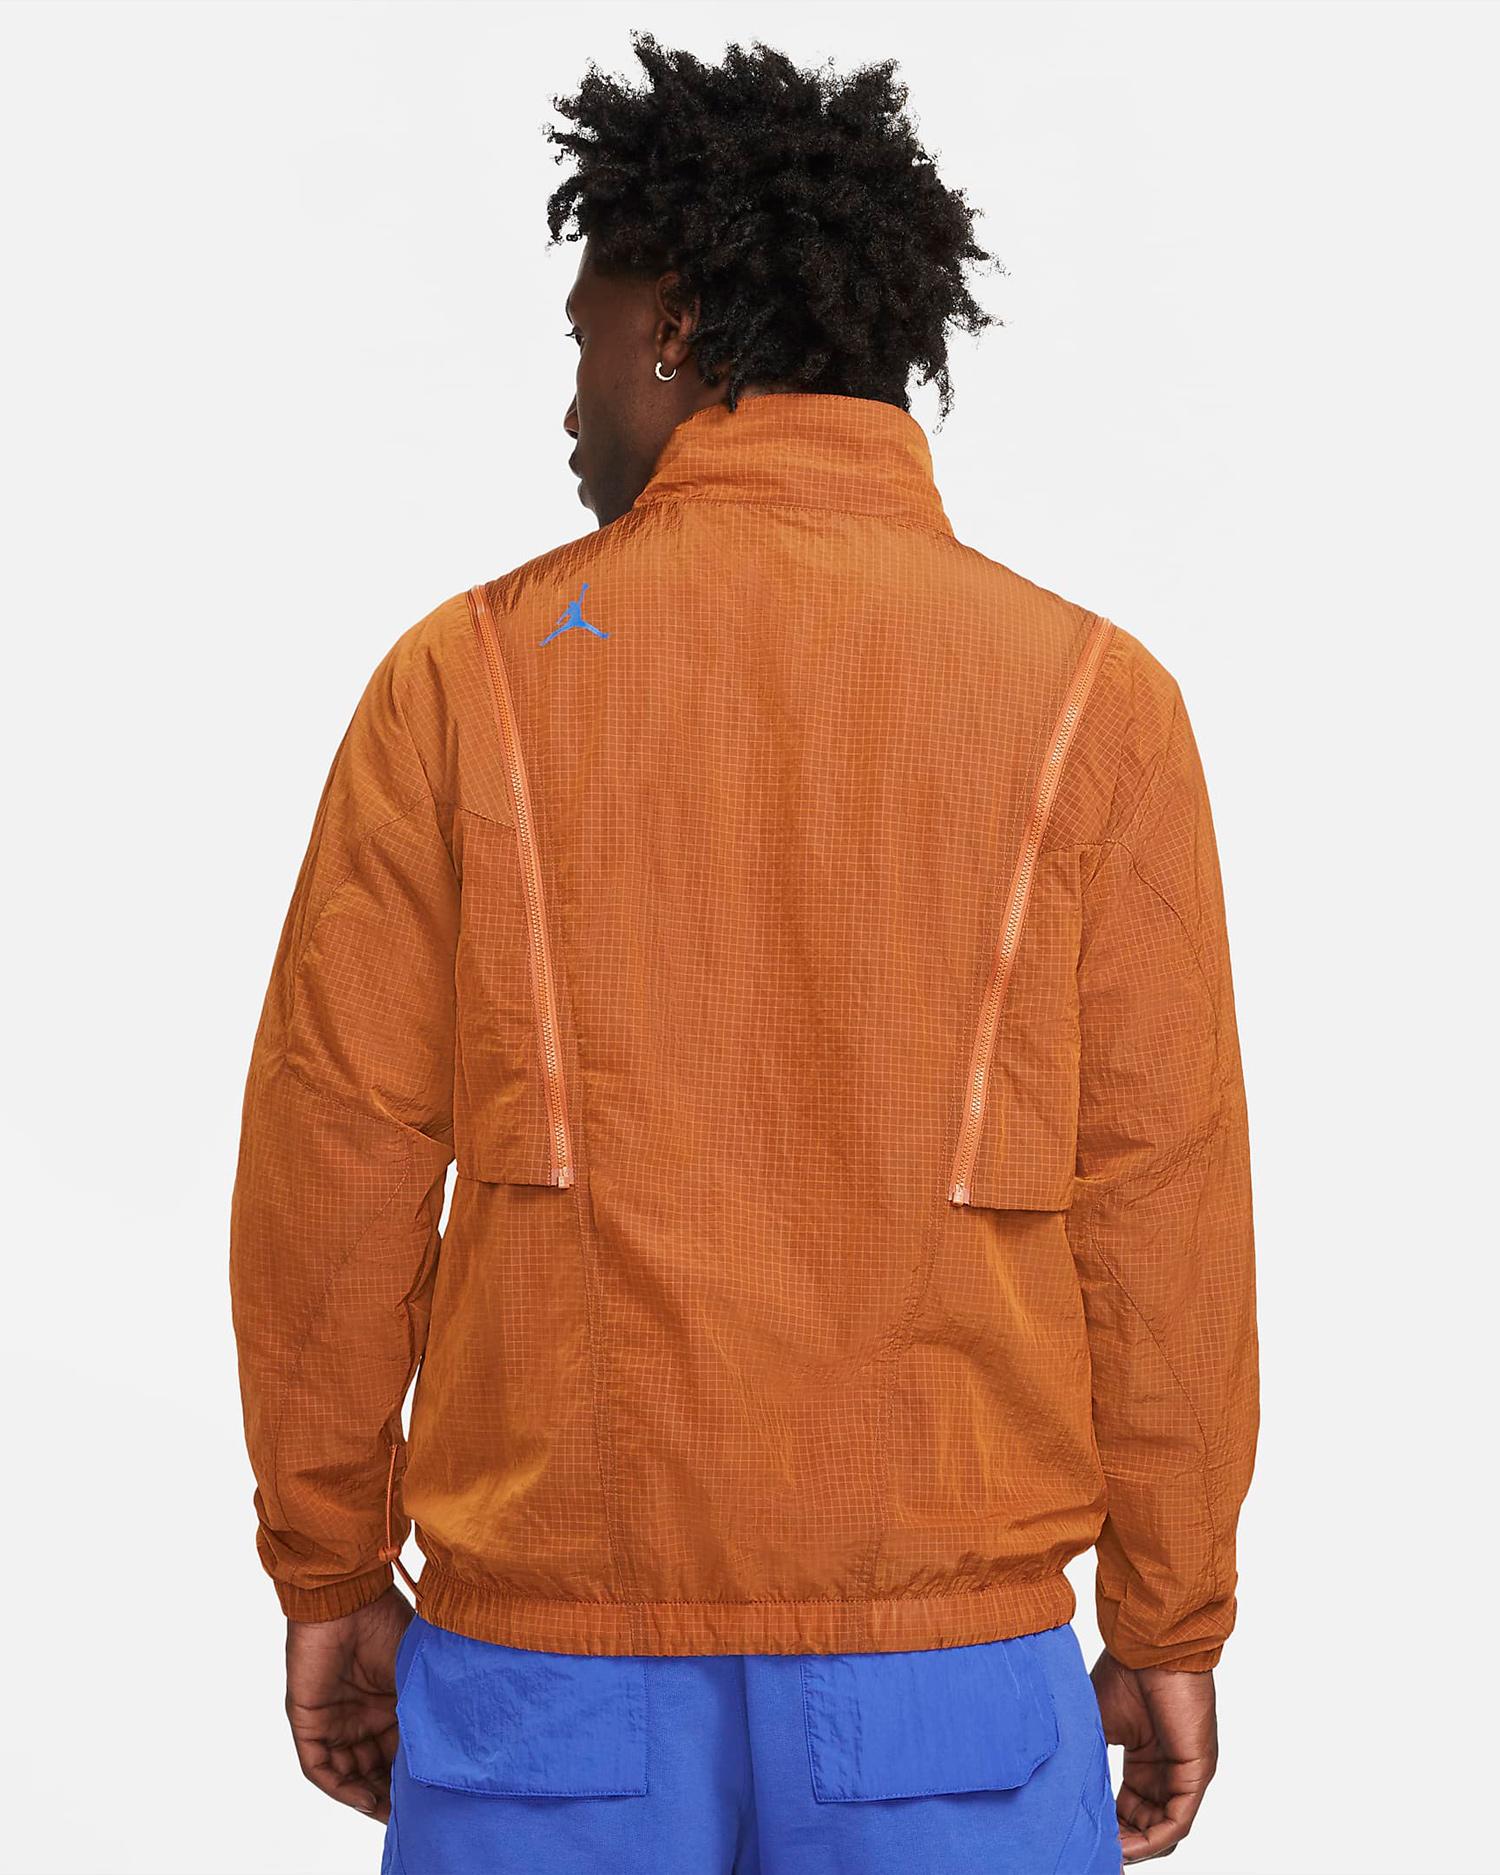 jordan-dark-russet-23-engineered-jacket-2